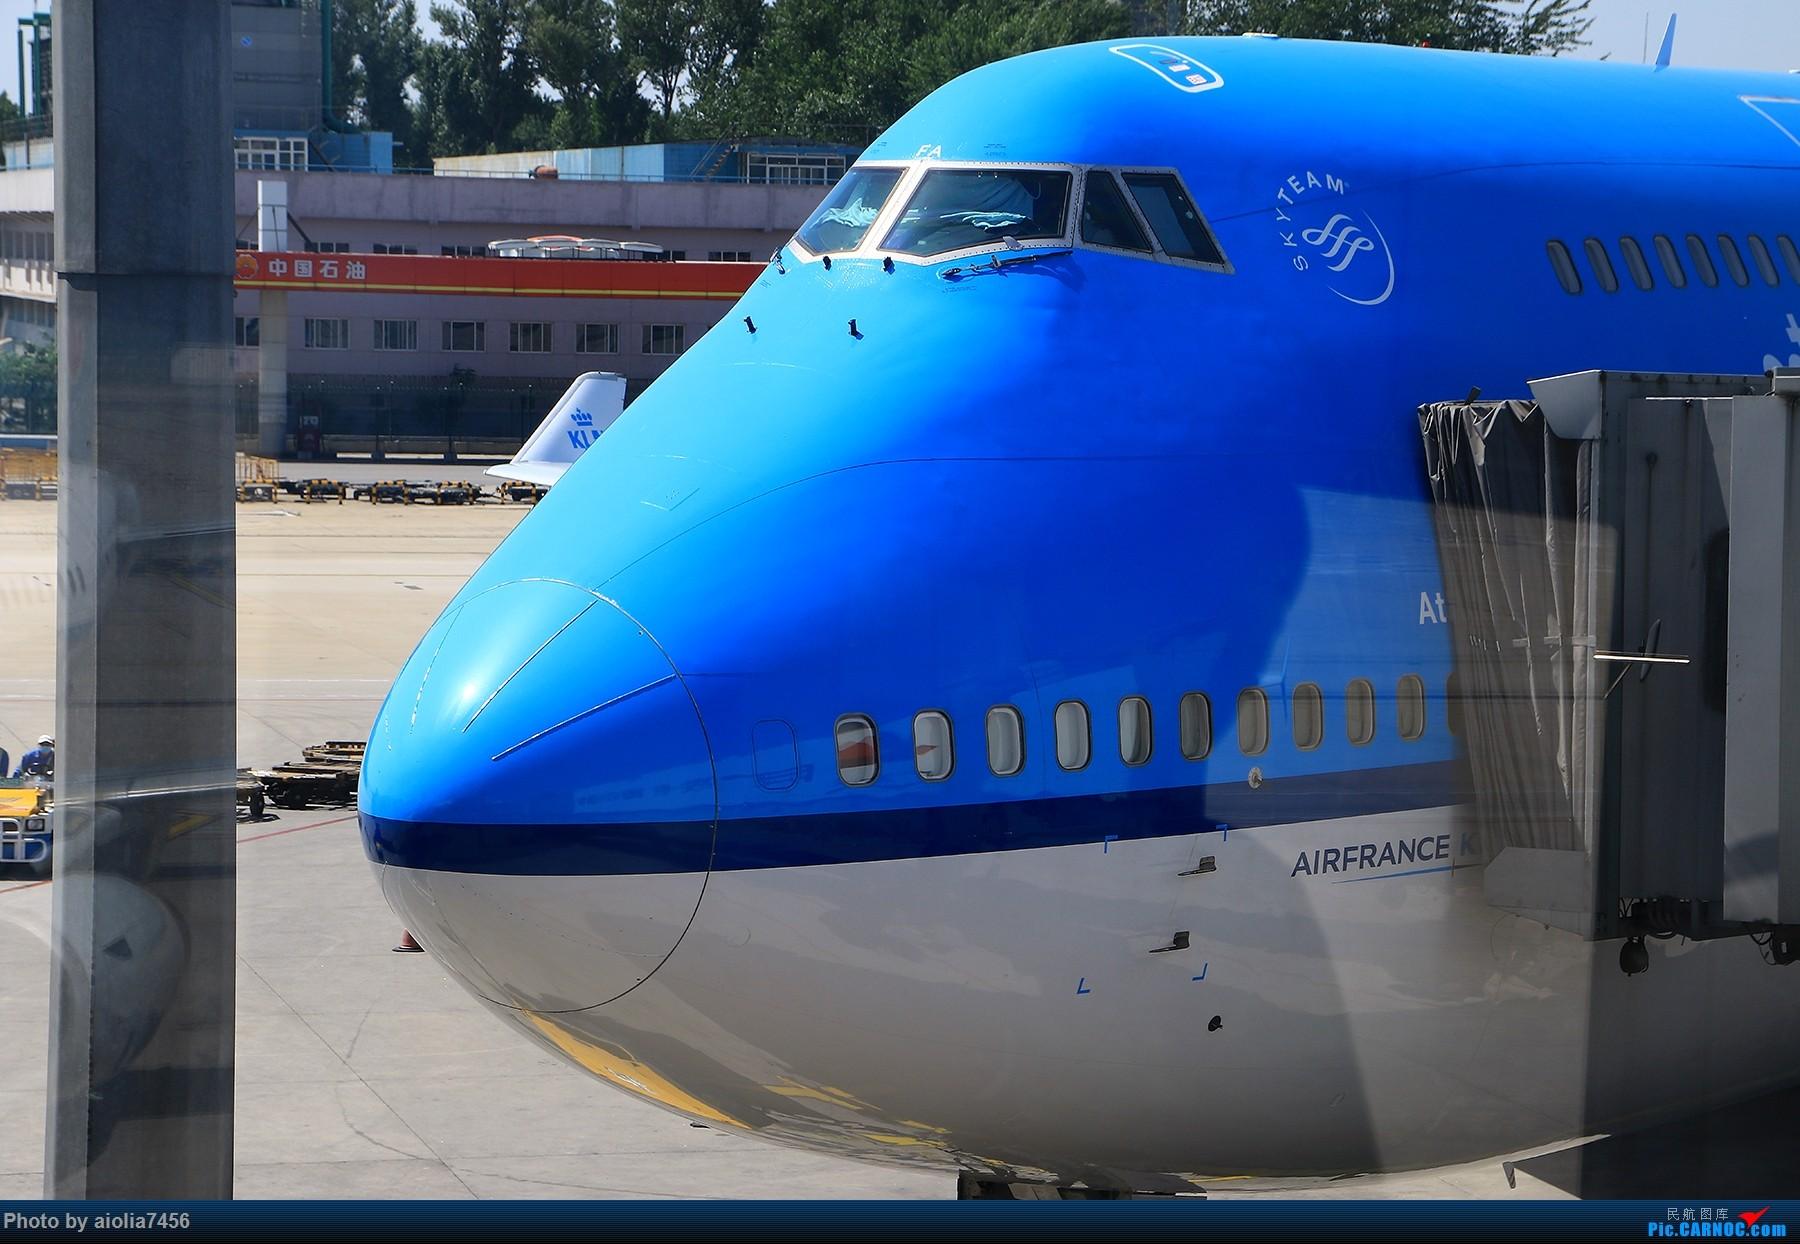 Re:[原创]【合肥飞友会】西行归来系列之三HFE/PEK/AMG/MAD/CDG/PVG/HFE西班牙游记之拥抱伊比利亚 BOEING 747-400 PH-BFA 中国北京首都国际机场